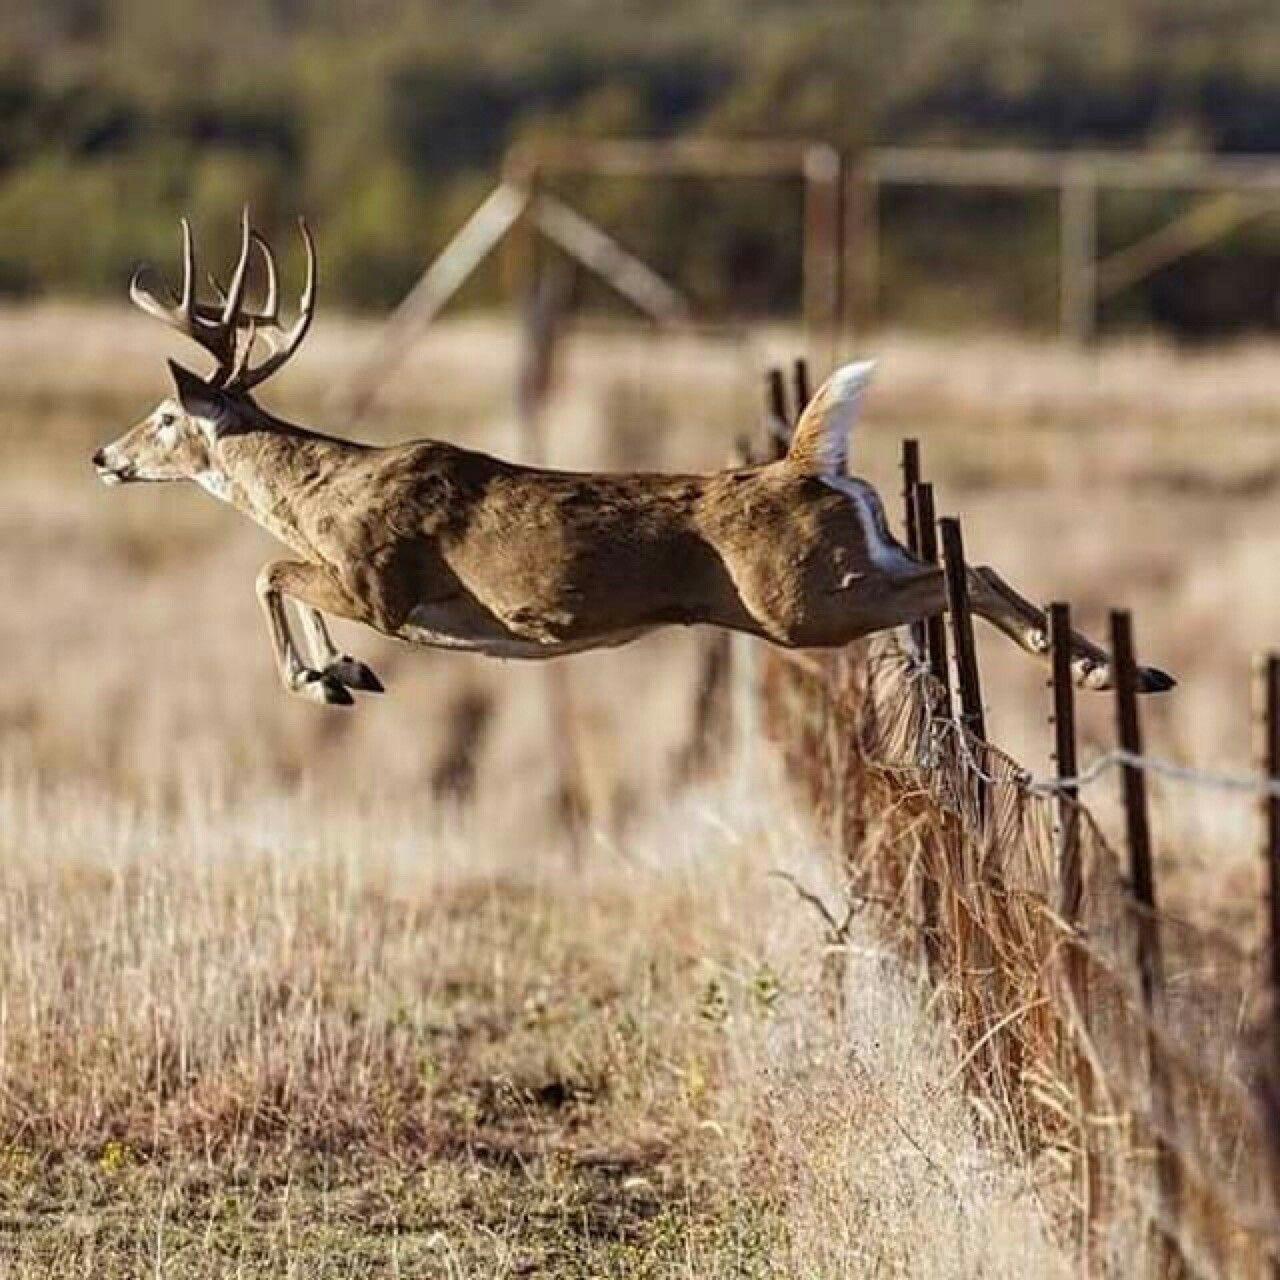 Pin de Burt Thompson en Deer | Pinterest | Cacería de ciervos ...